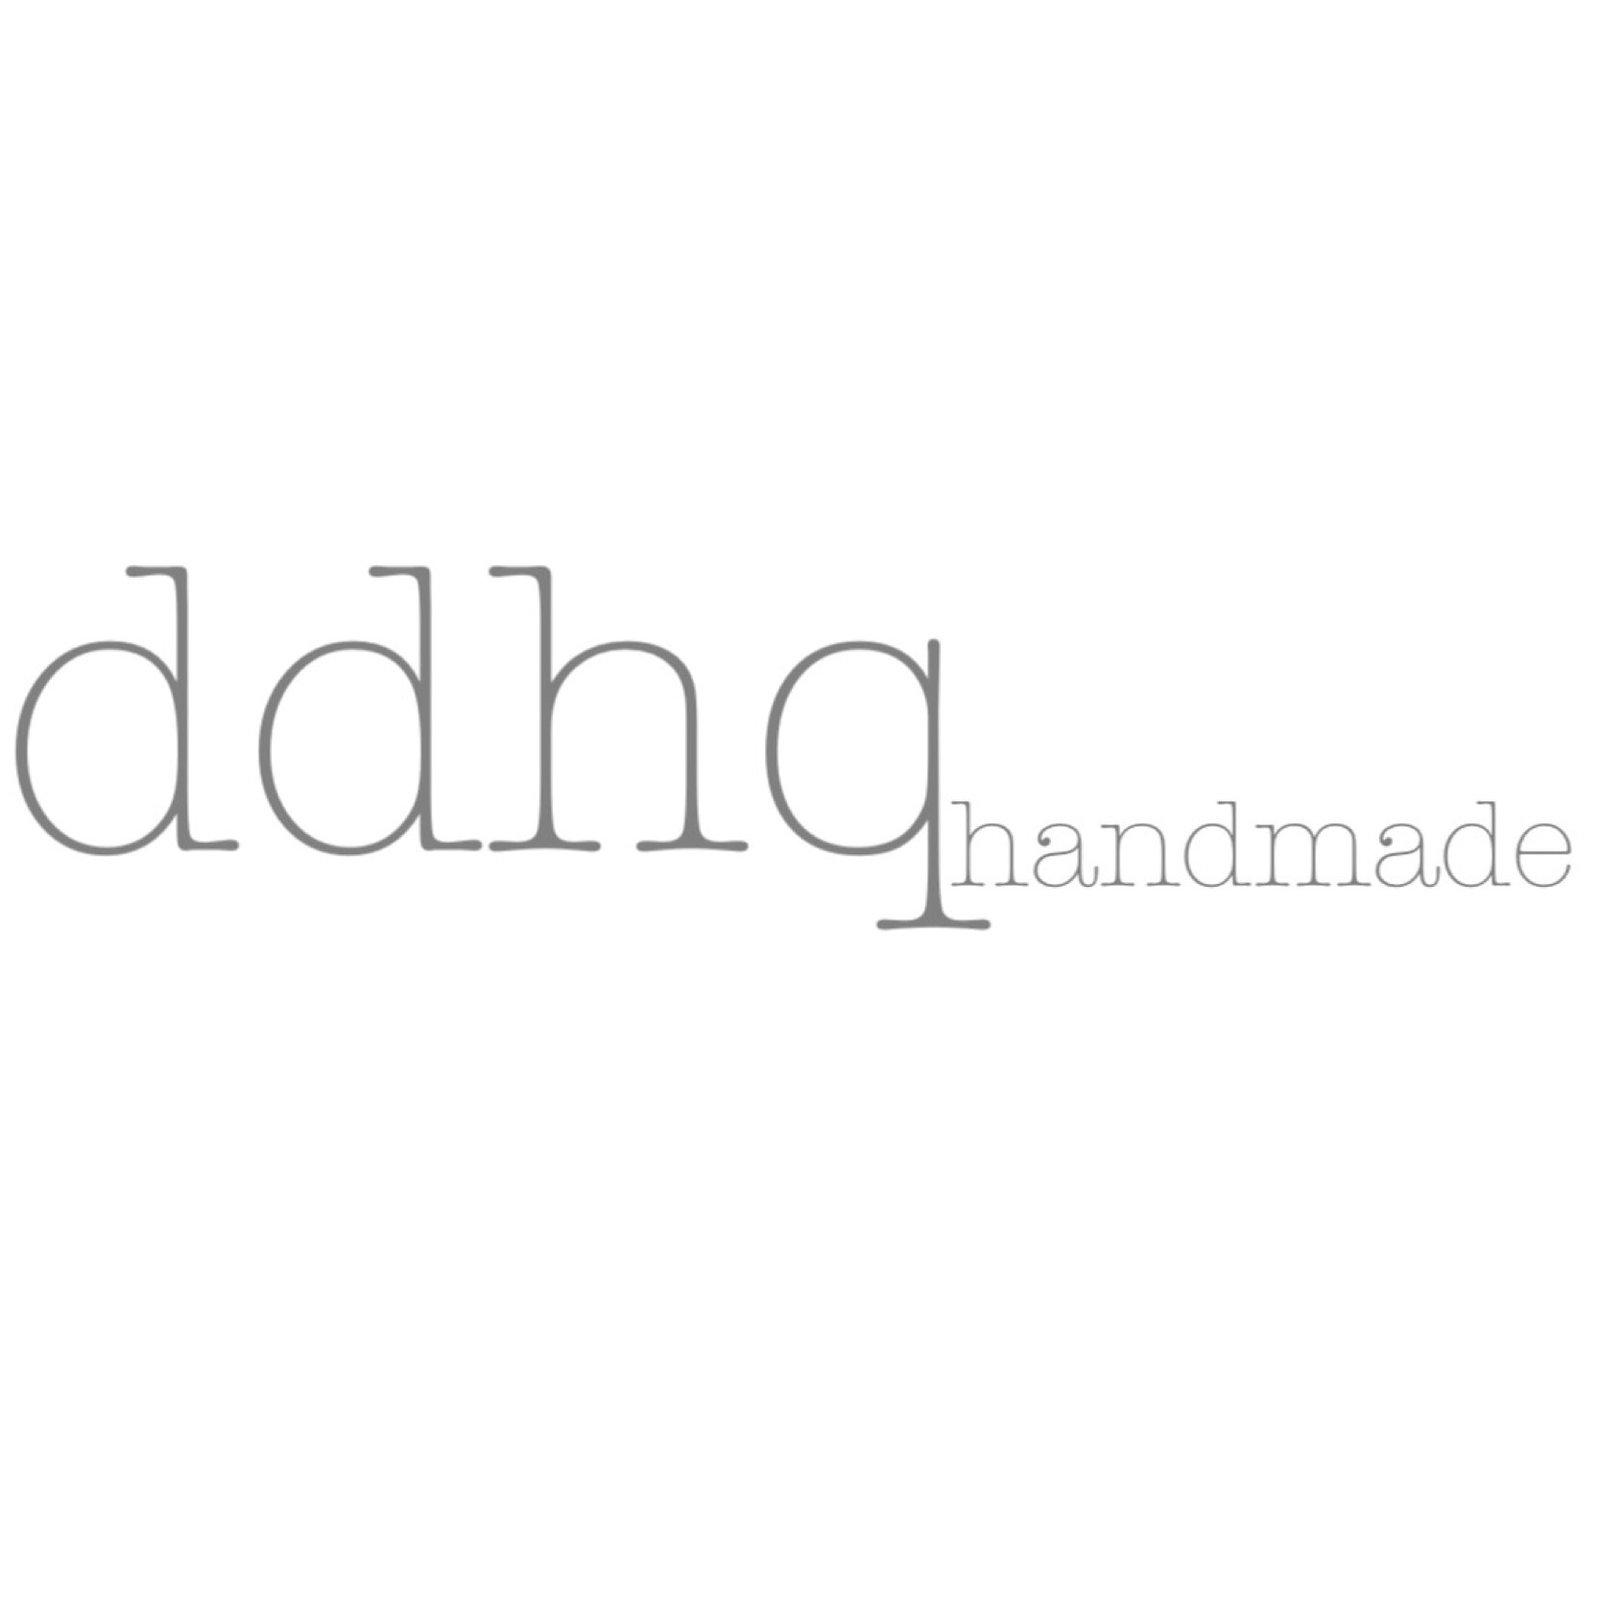 DDHQ Handmade